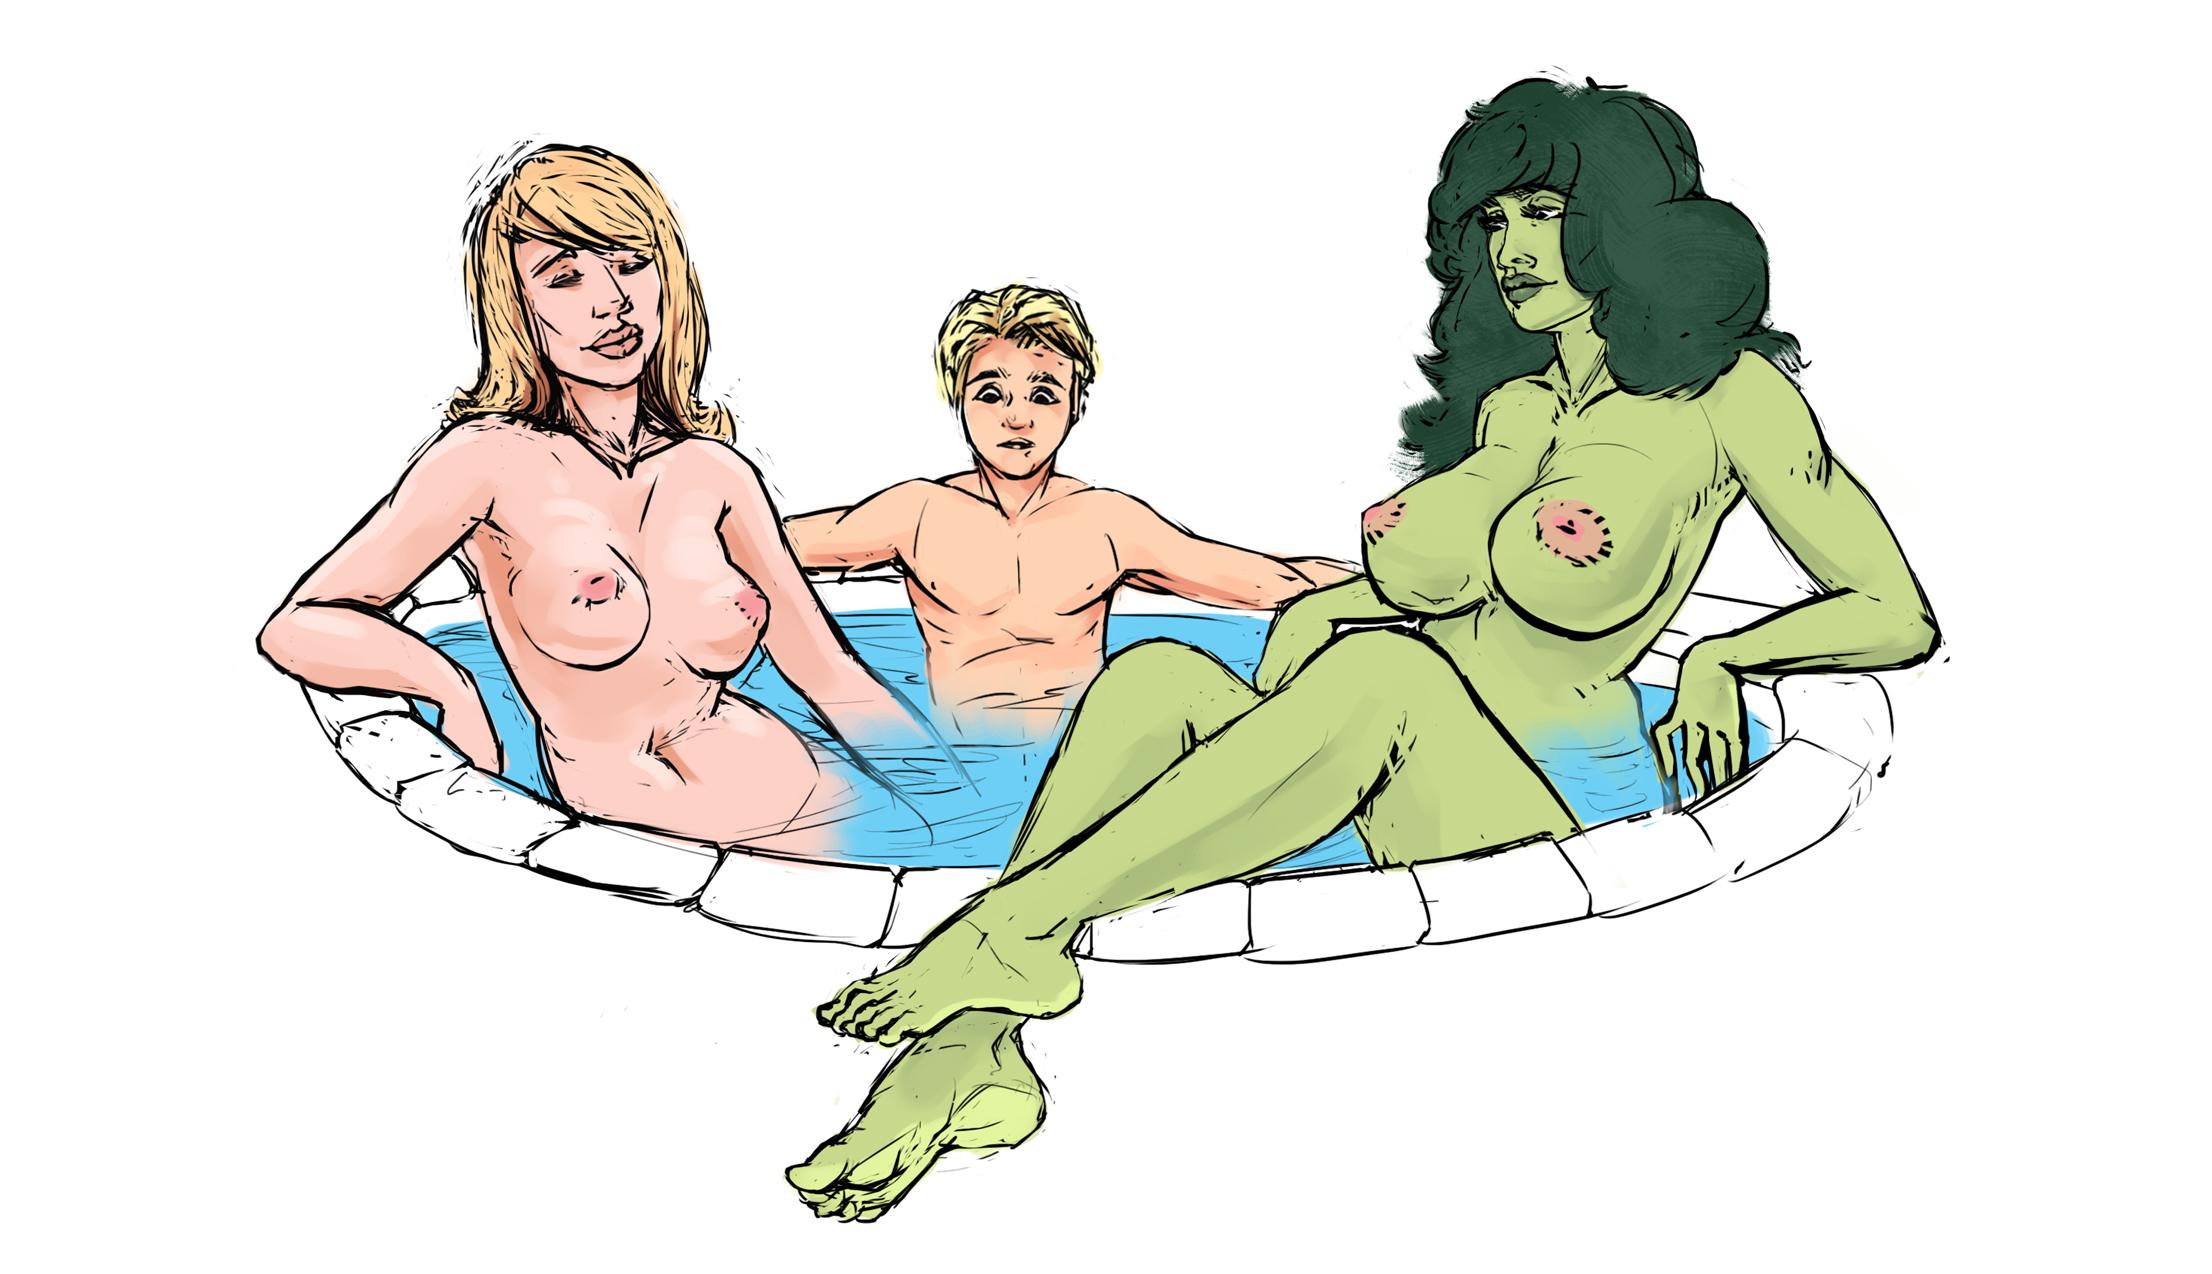 Nude fantastic four cartoon adult movie